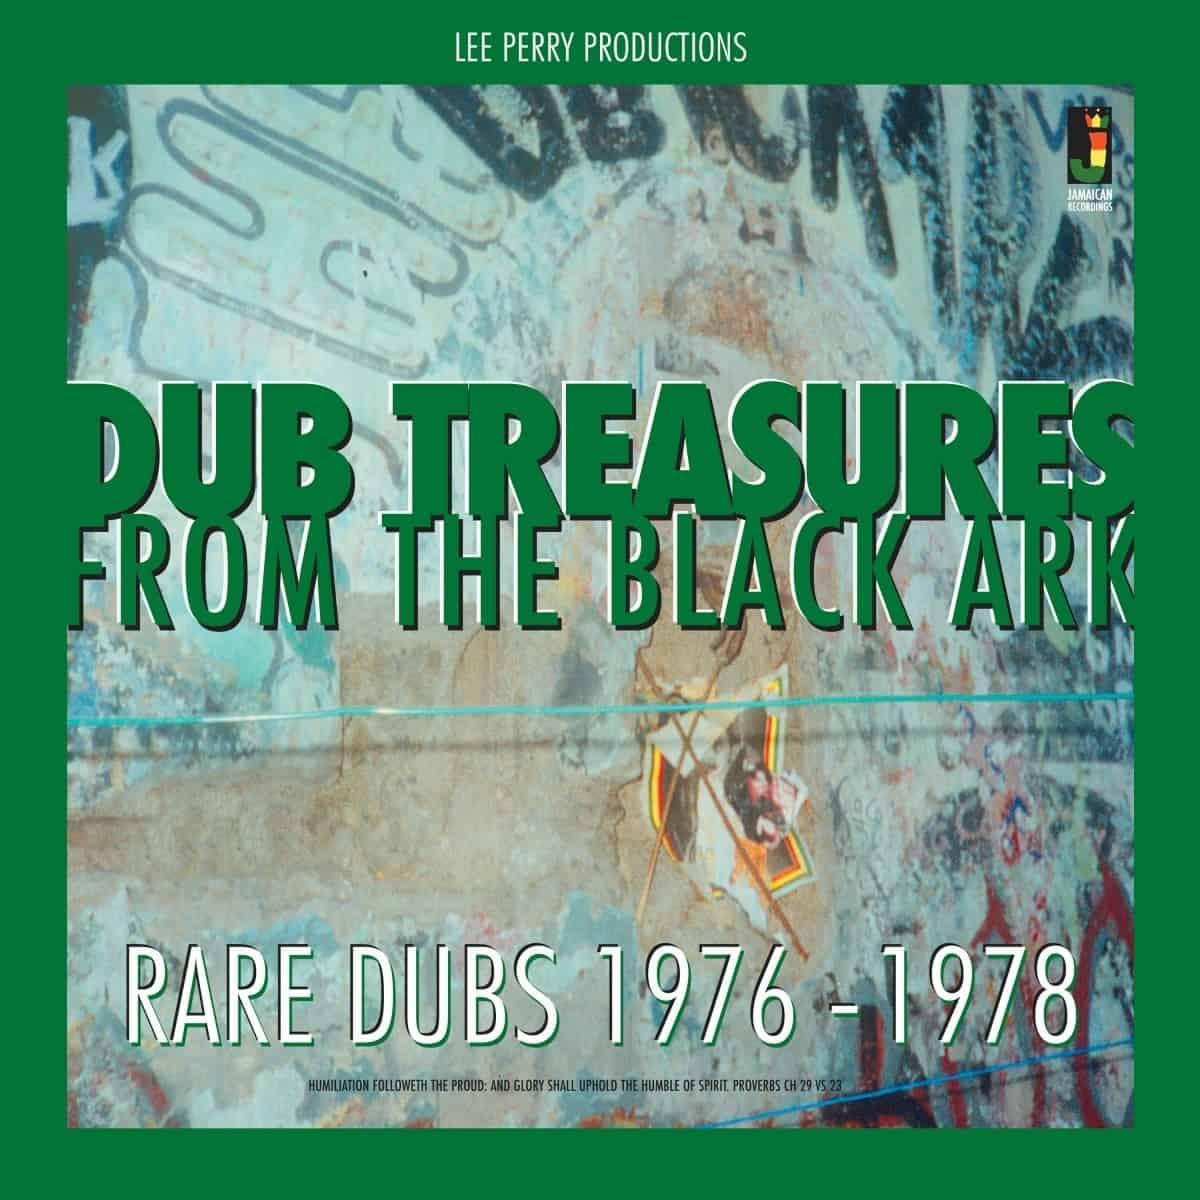 Dub Treasures From The Black Ark - Rare Dubs 1976-1978